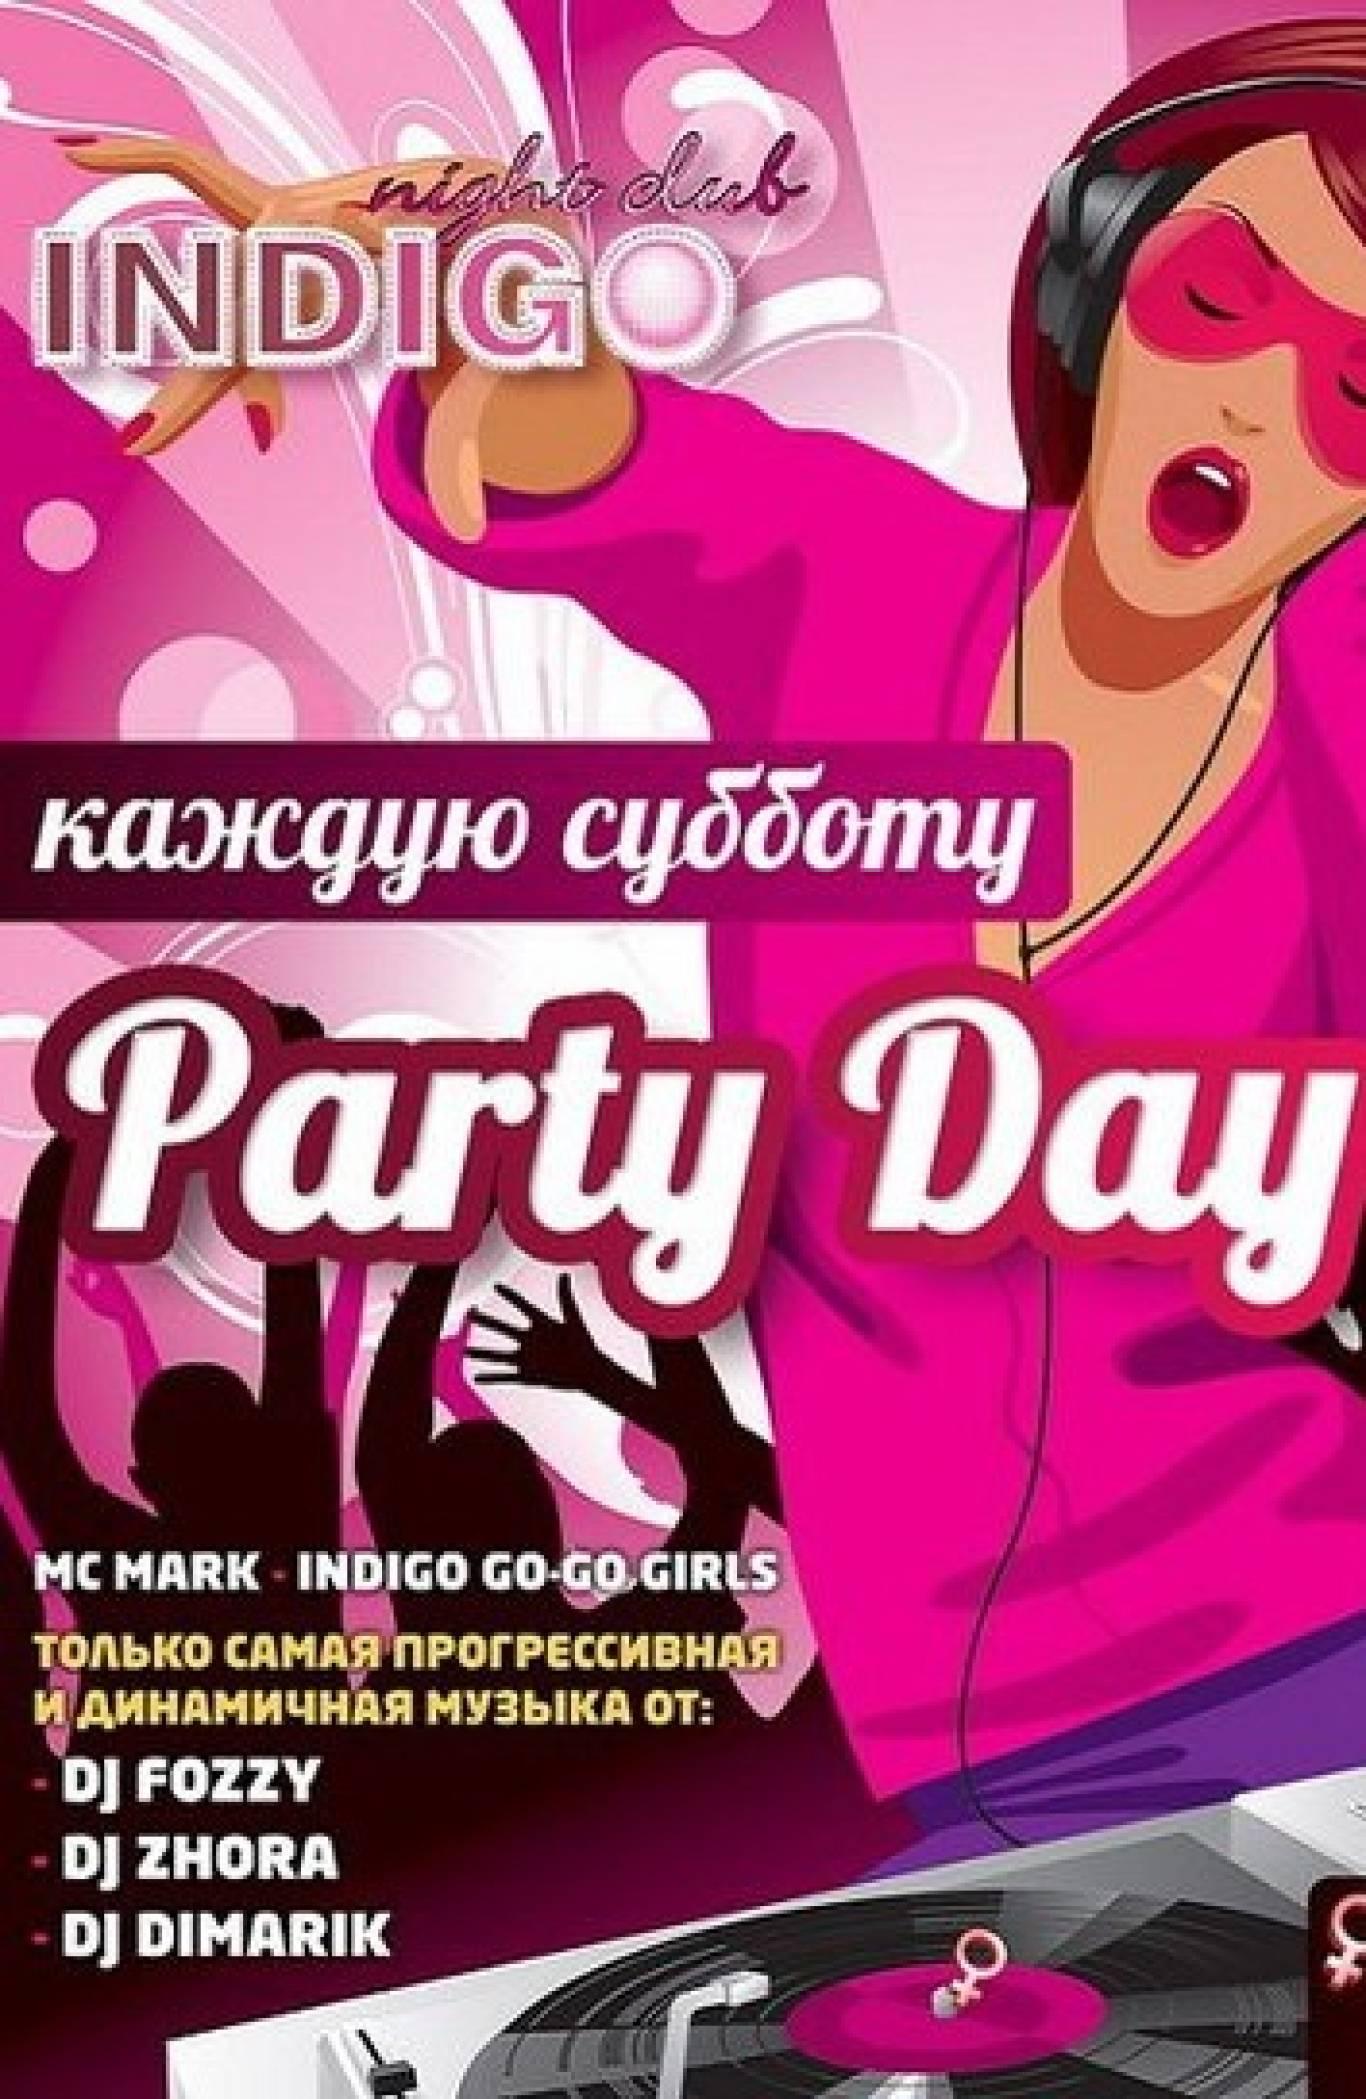 Party day кожну суботу в INDIGO